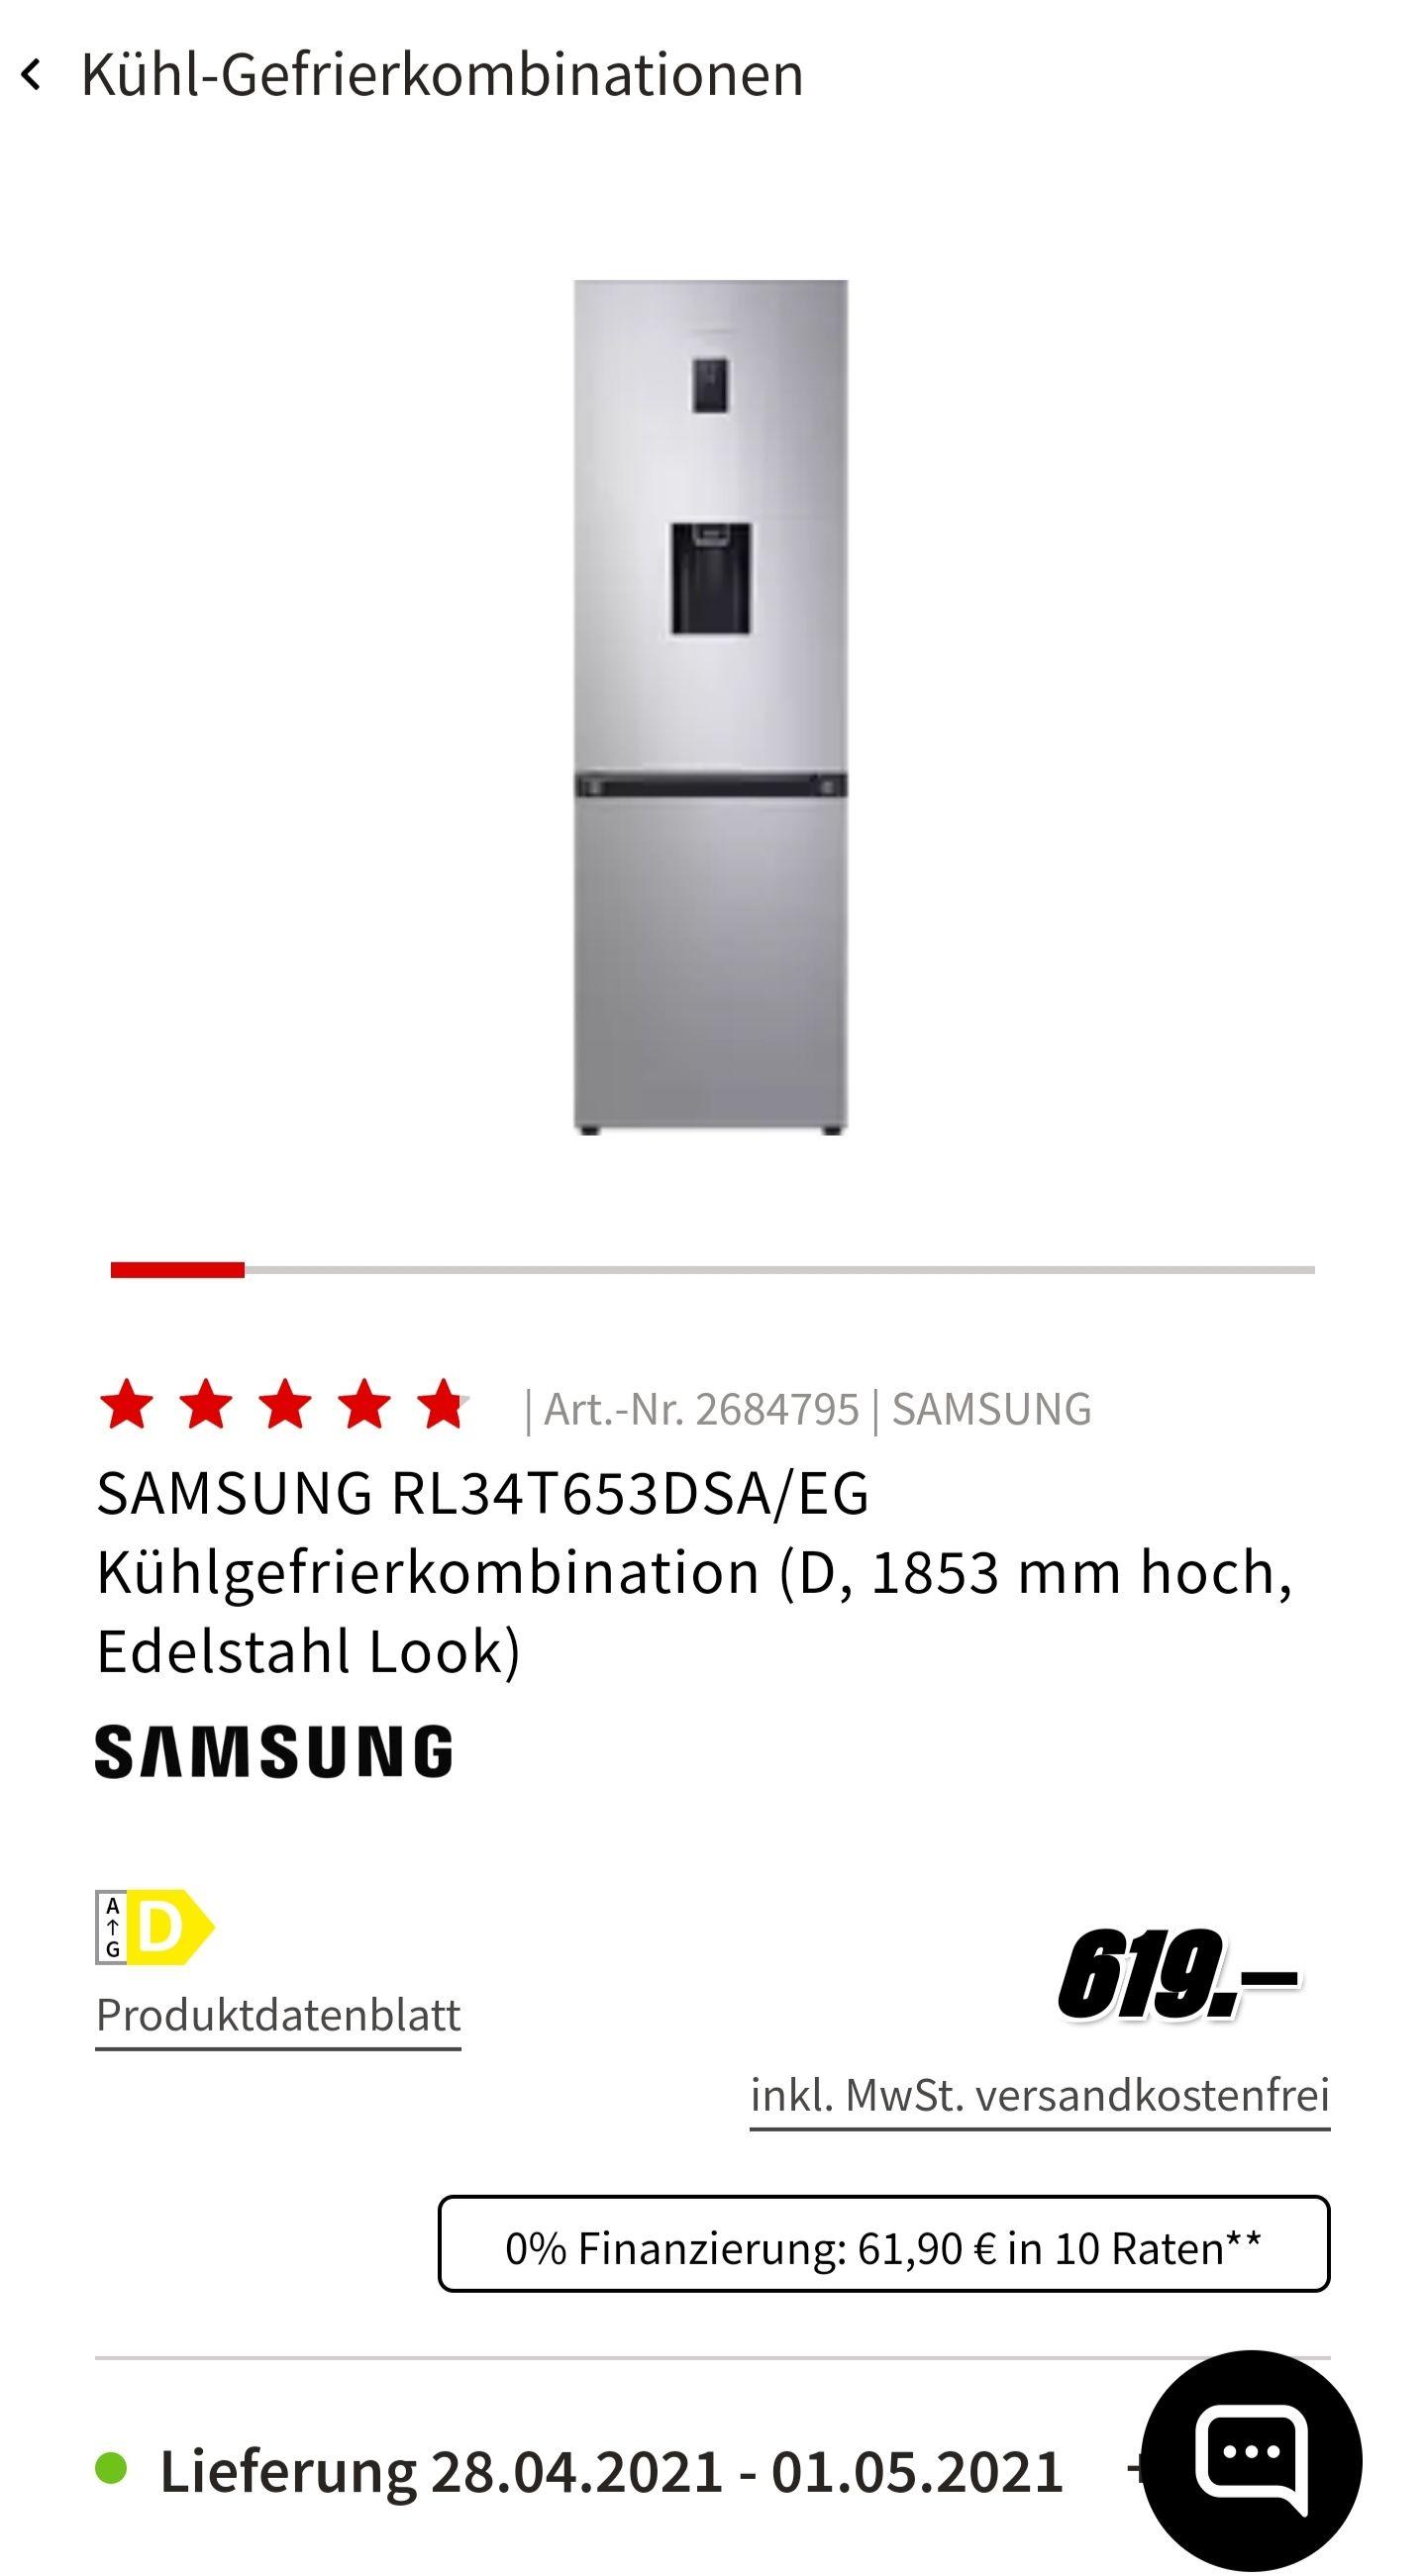 Samsung RL34T653DSA/EG Kühl-/Gefrierkombination / 185 cm Höhe / 331 Liter / Edelstahl Look / No Frost+ / Space Max / Wasserspender